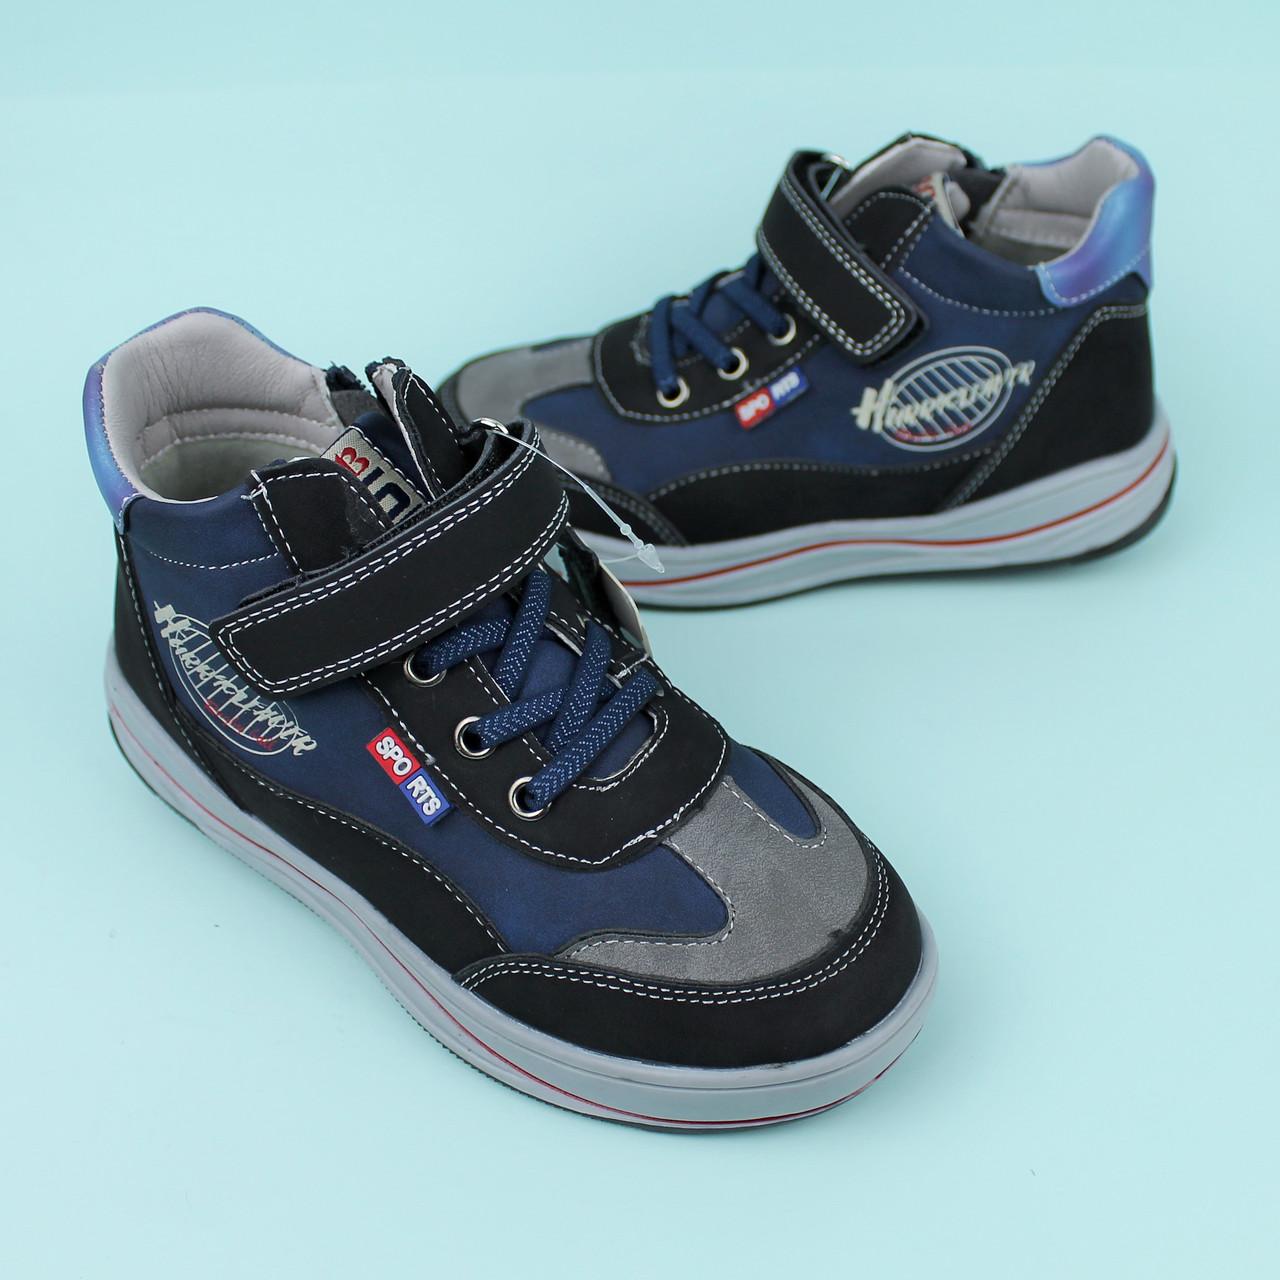 Ботинки на осень на мальчика синие тм Том.м размер 28,29,30,31,32,33